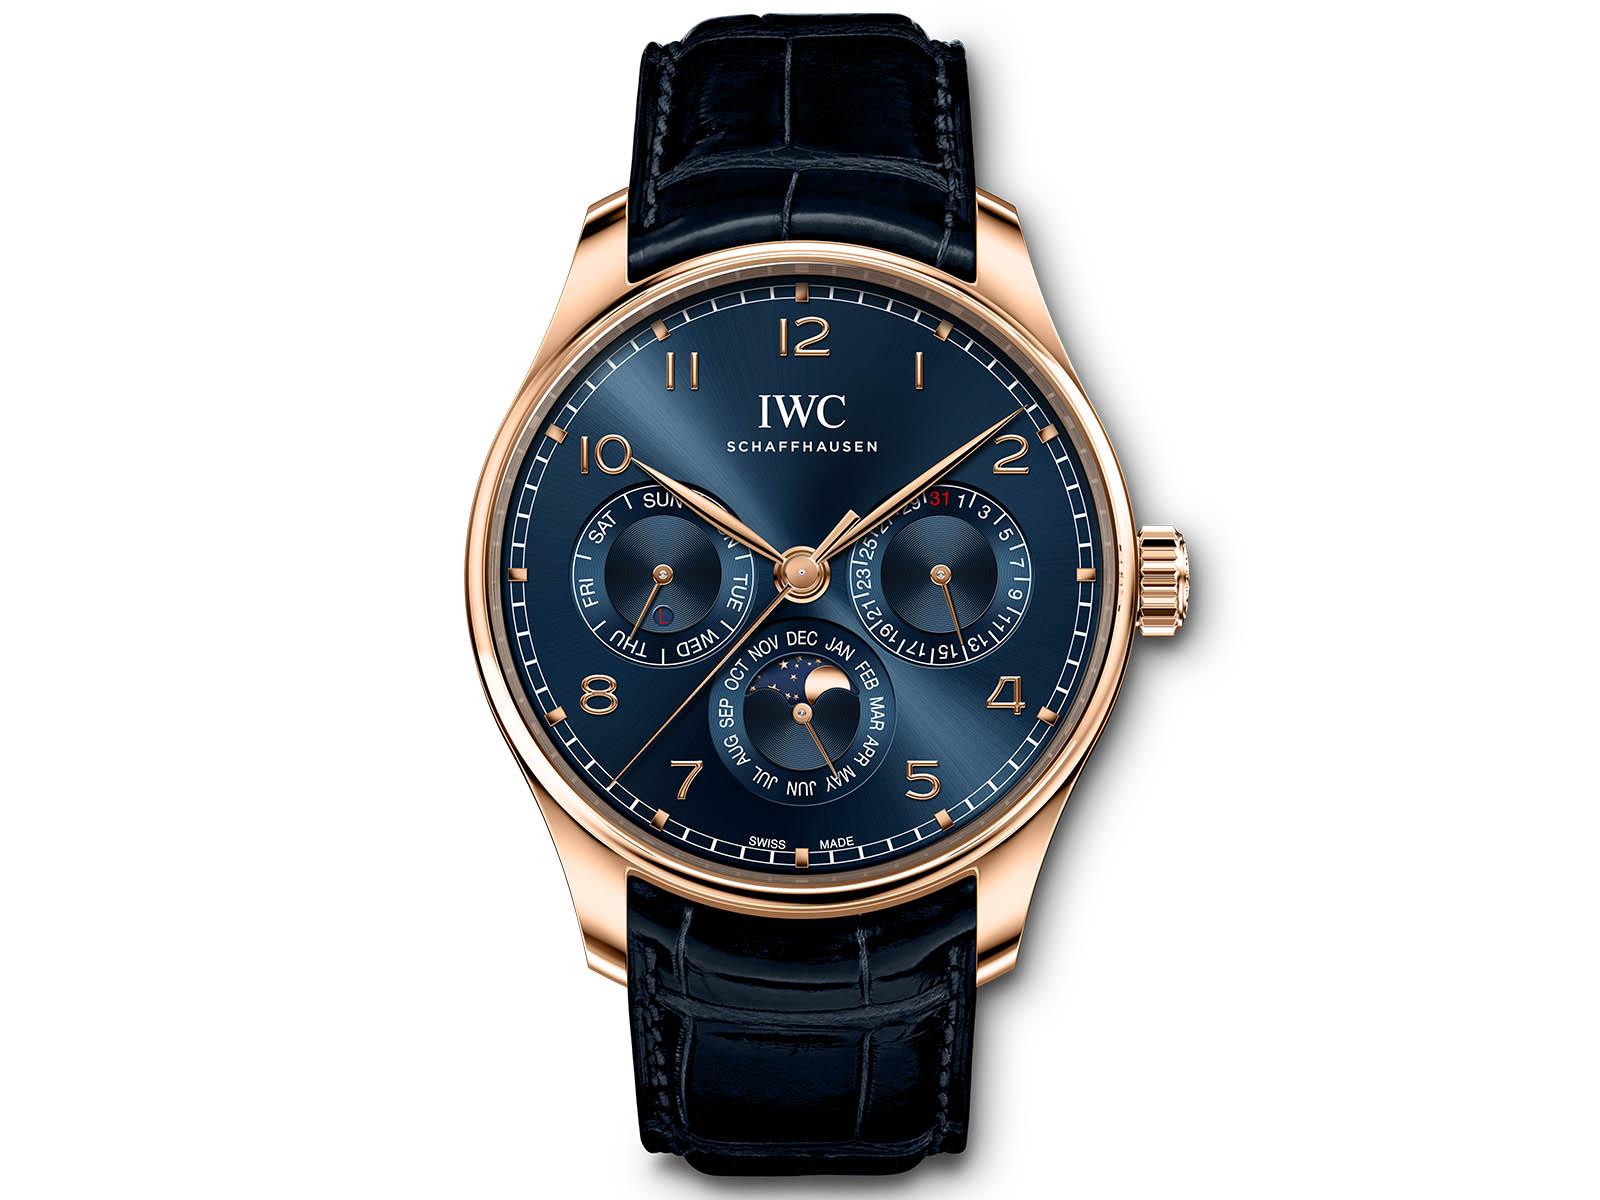 iw344205-iwc-schaffhausen-portugieser-perpetual-calendar-42-watches-wonders-2020-1.jpg